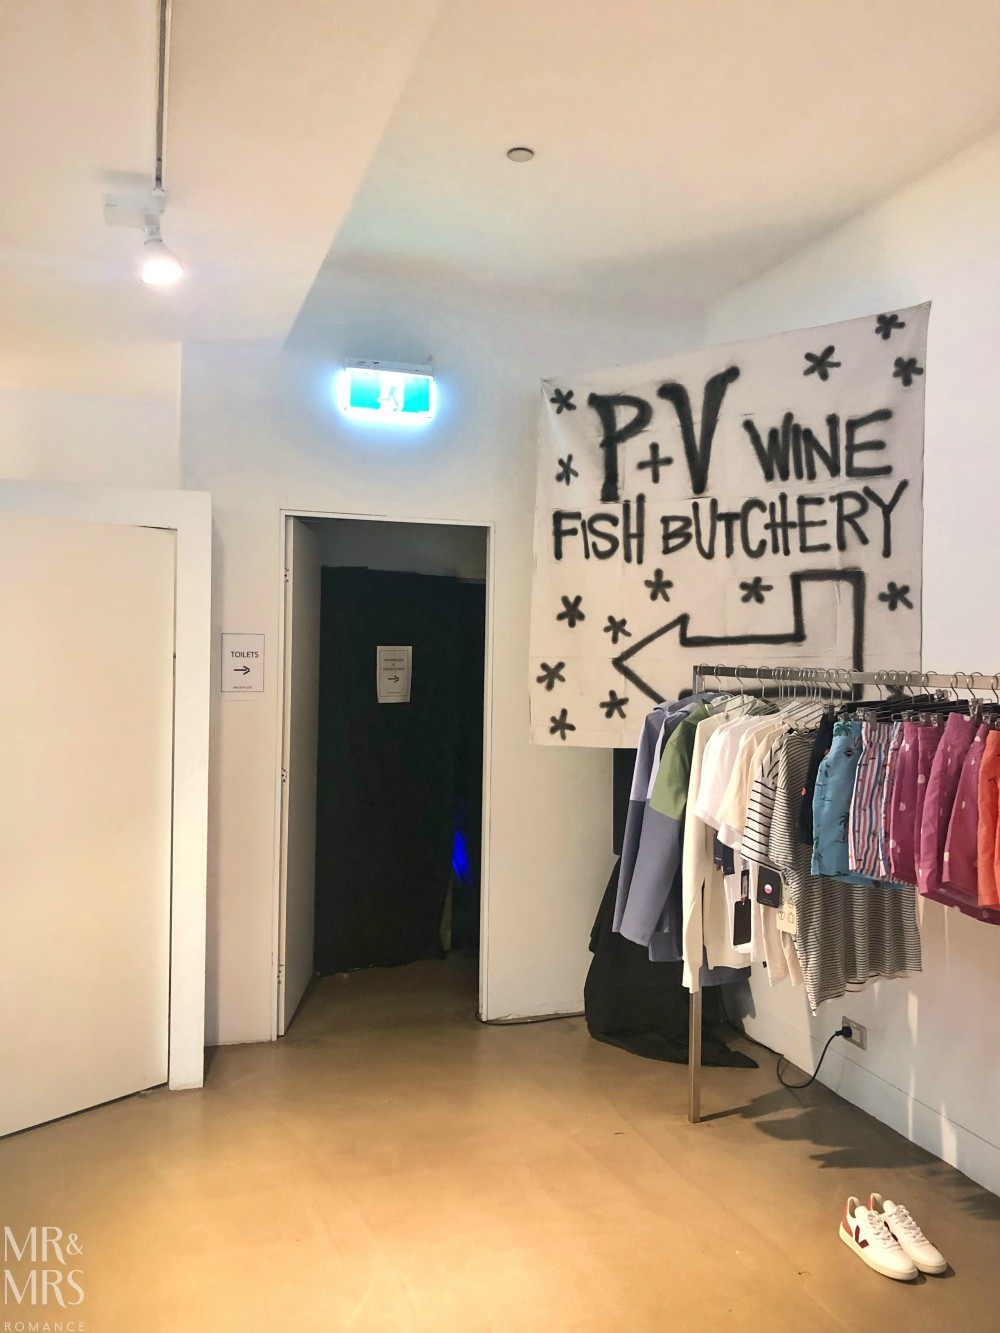 Rack Off P&V Wines X Fish Butchers